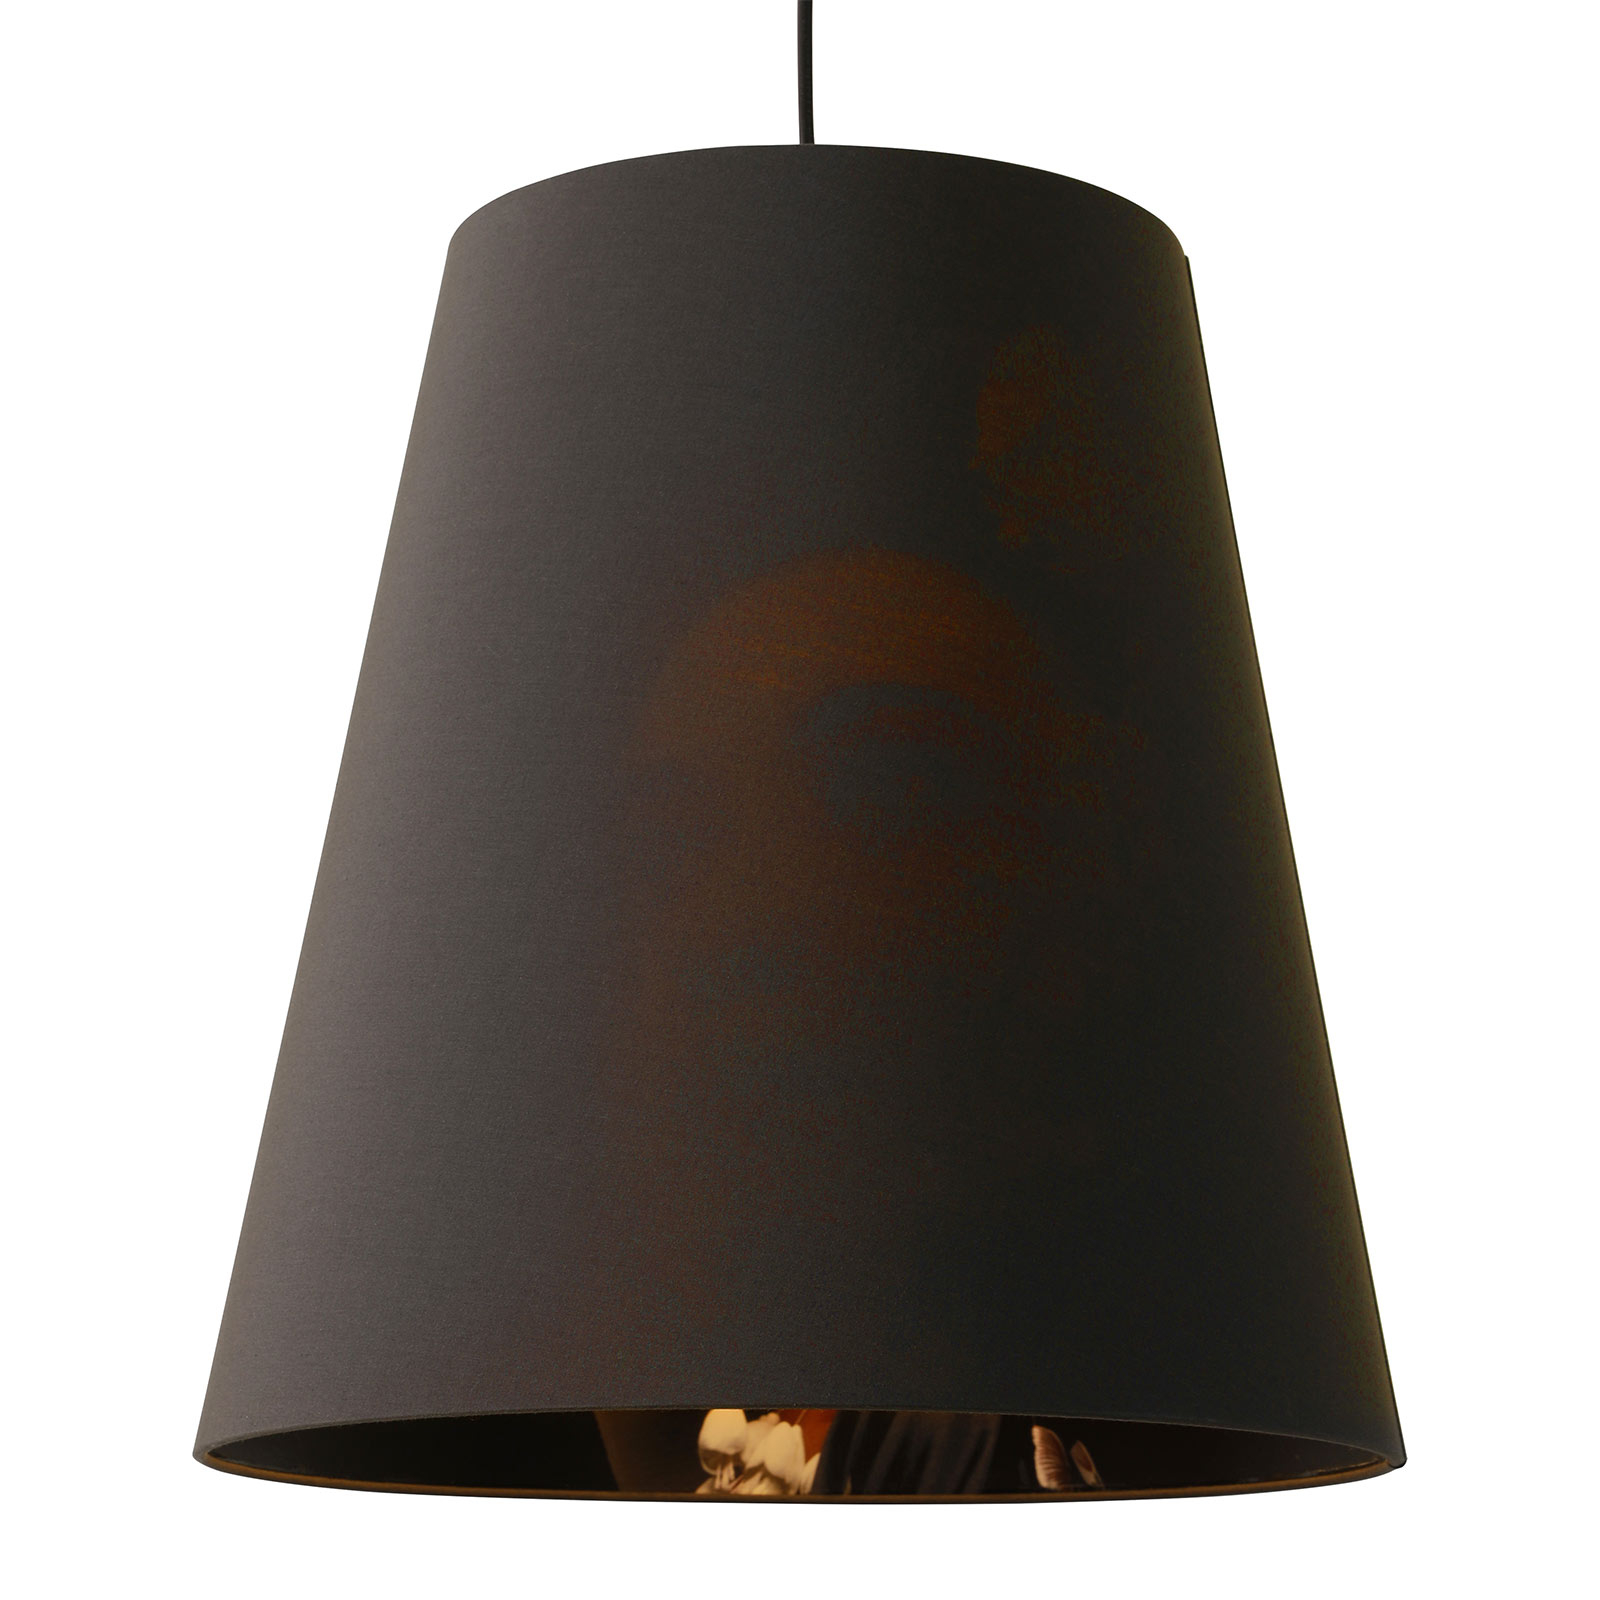 Karman Cupido hanglamp met kap Ø 40 cm